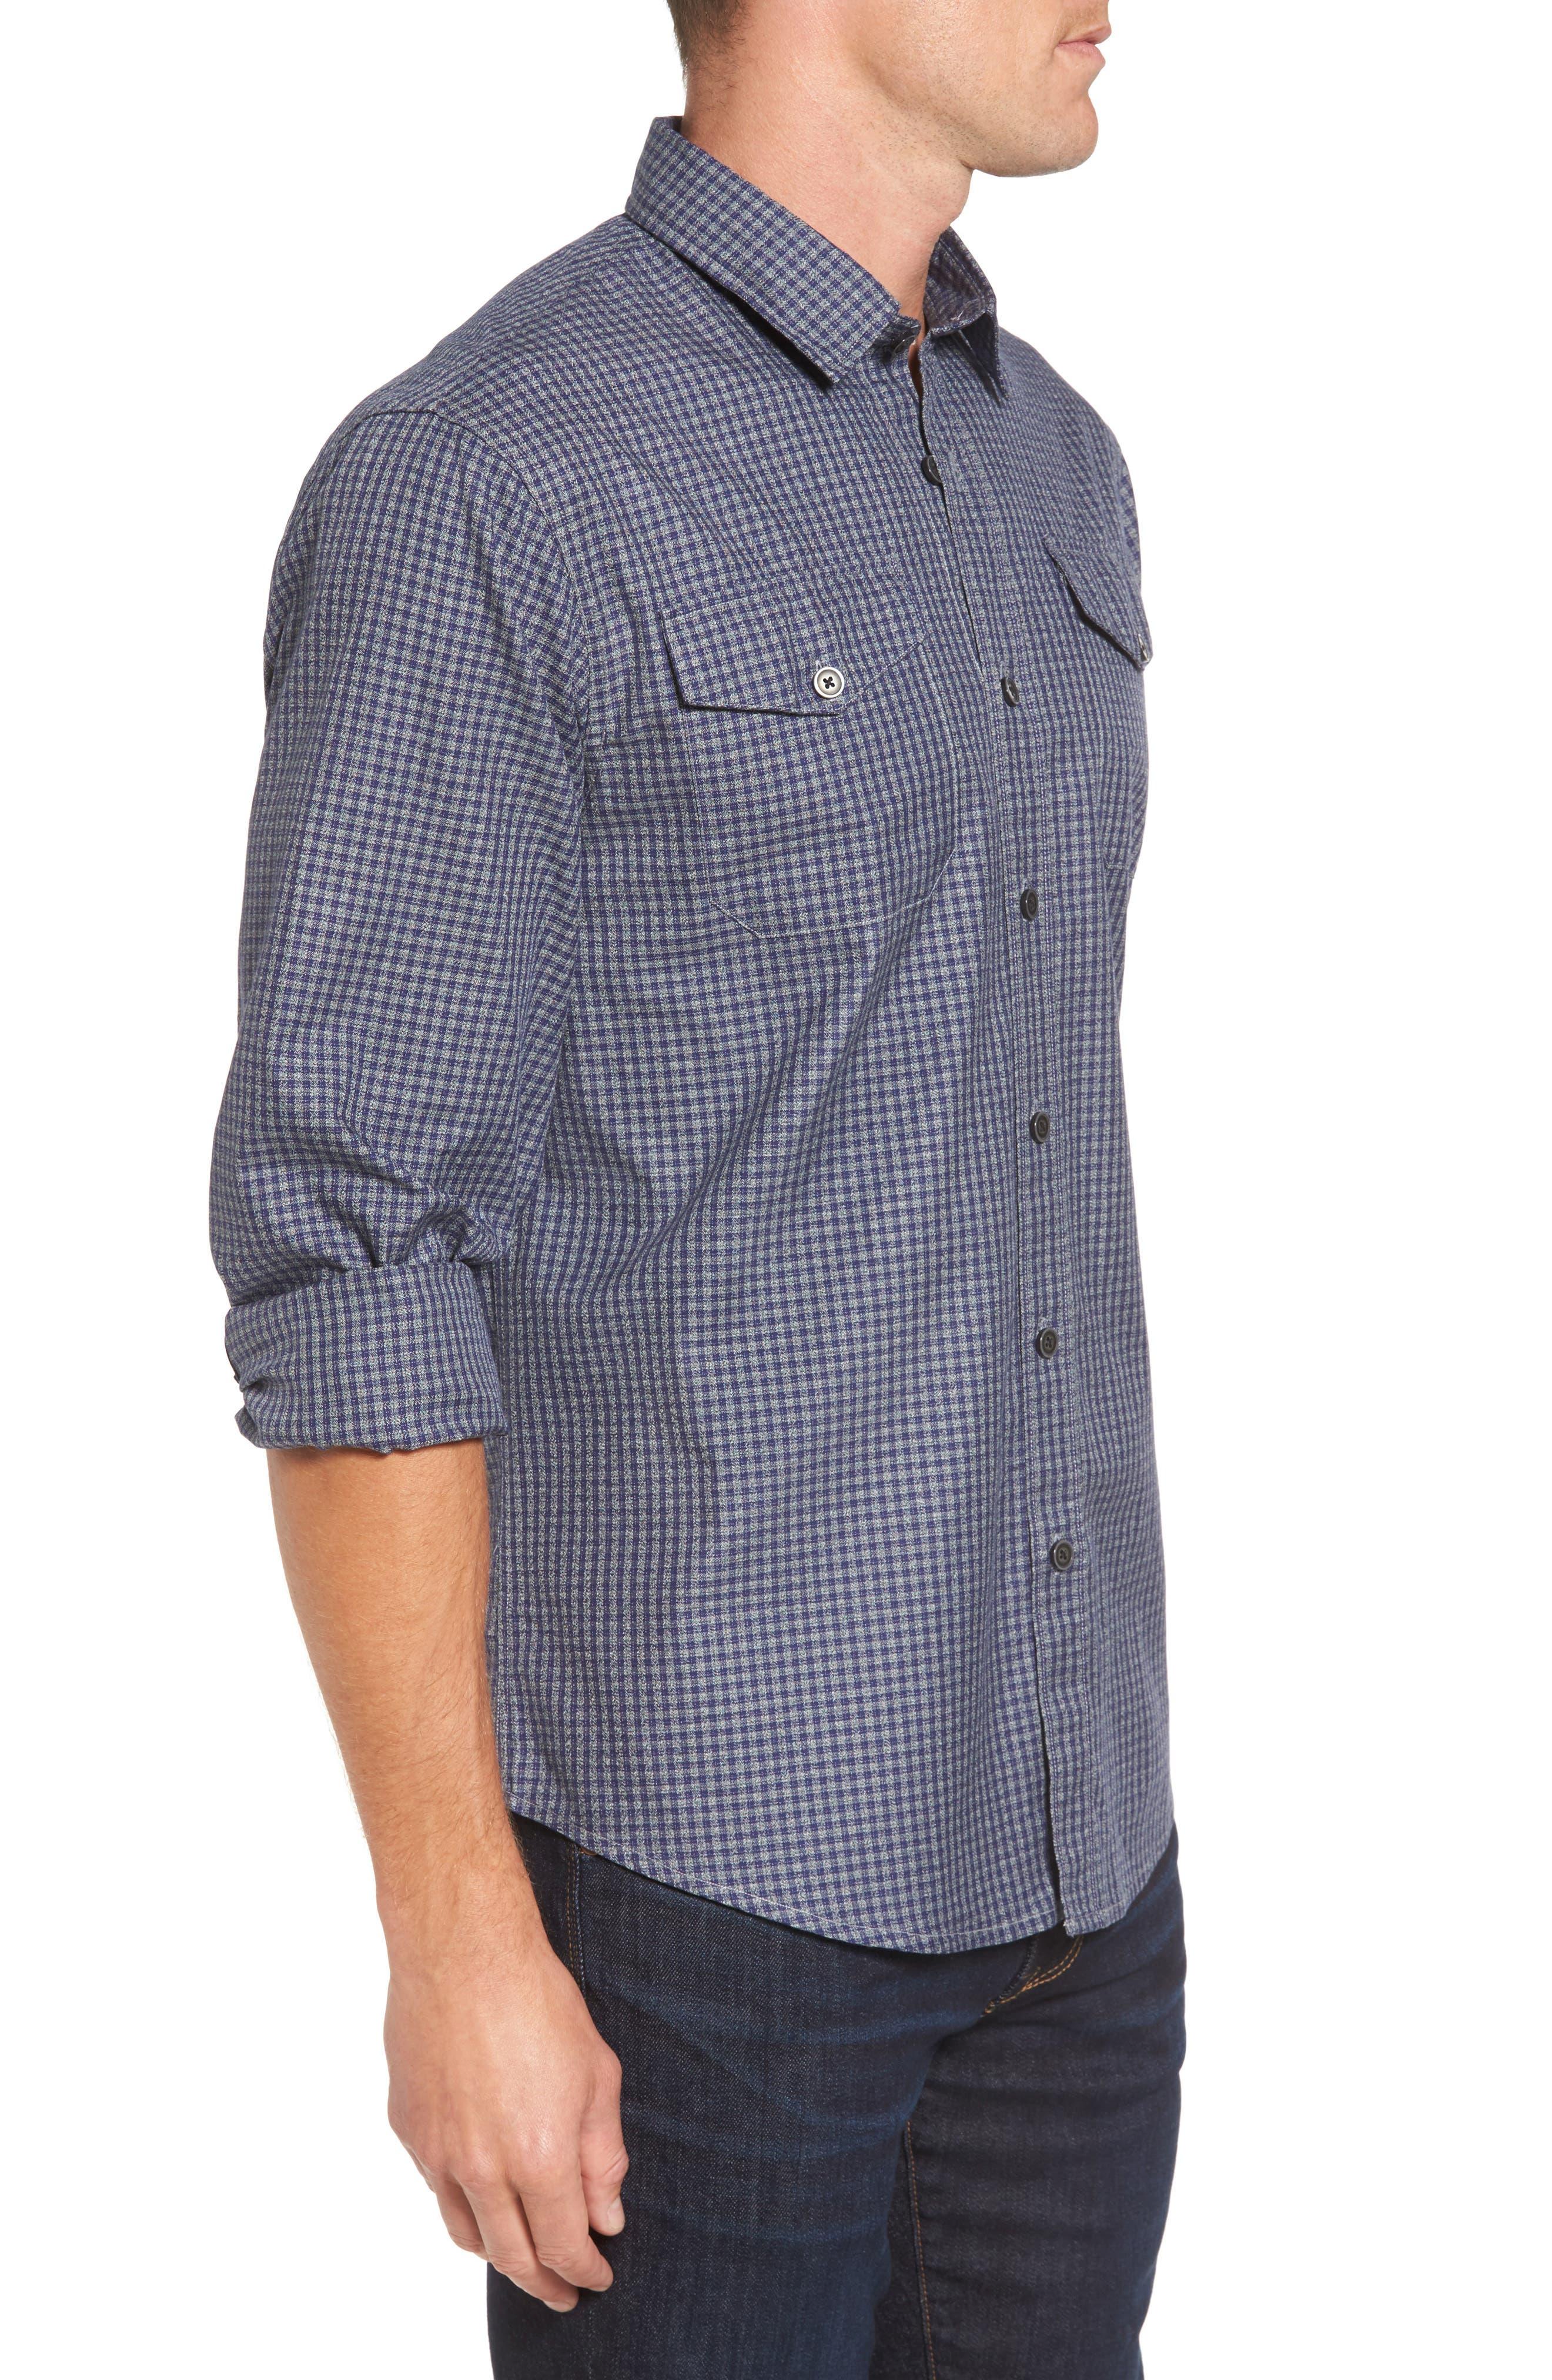 Alternate Image 3  - Coastaoro Main Street Check Flannel Shirt